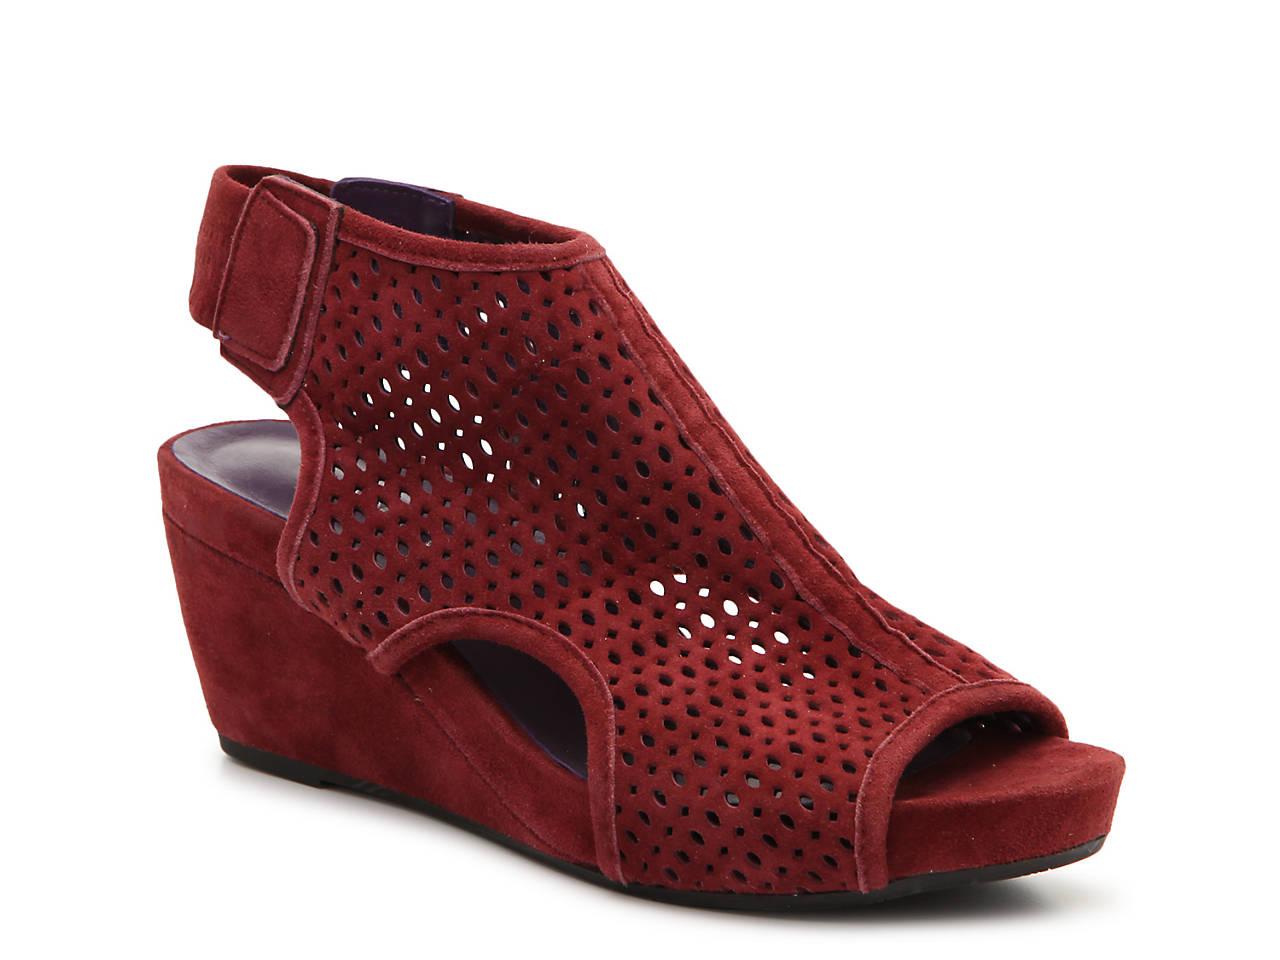 f49363ed663b VANELi Inez Wedge Sandal Women s Shoes